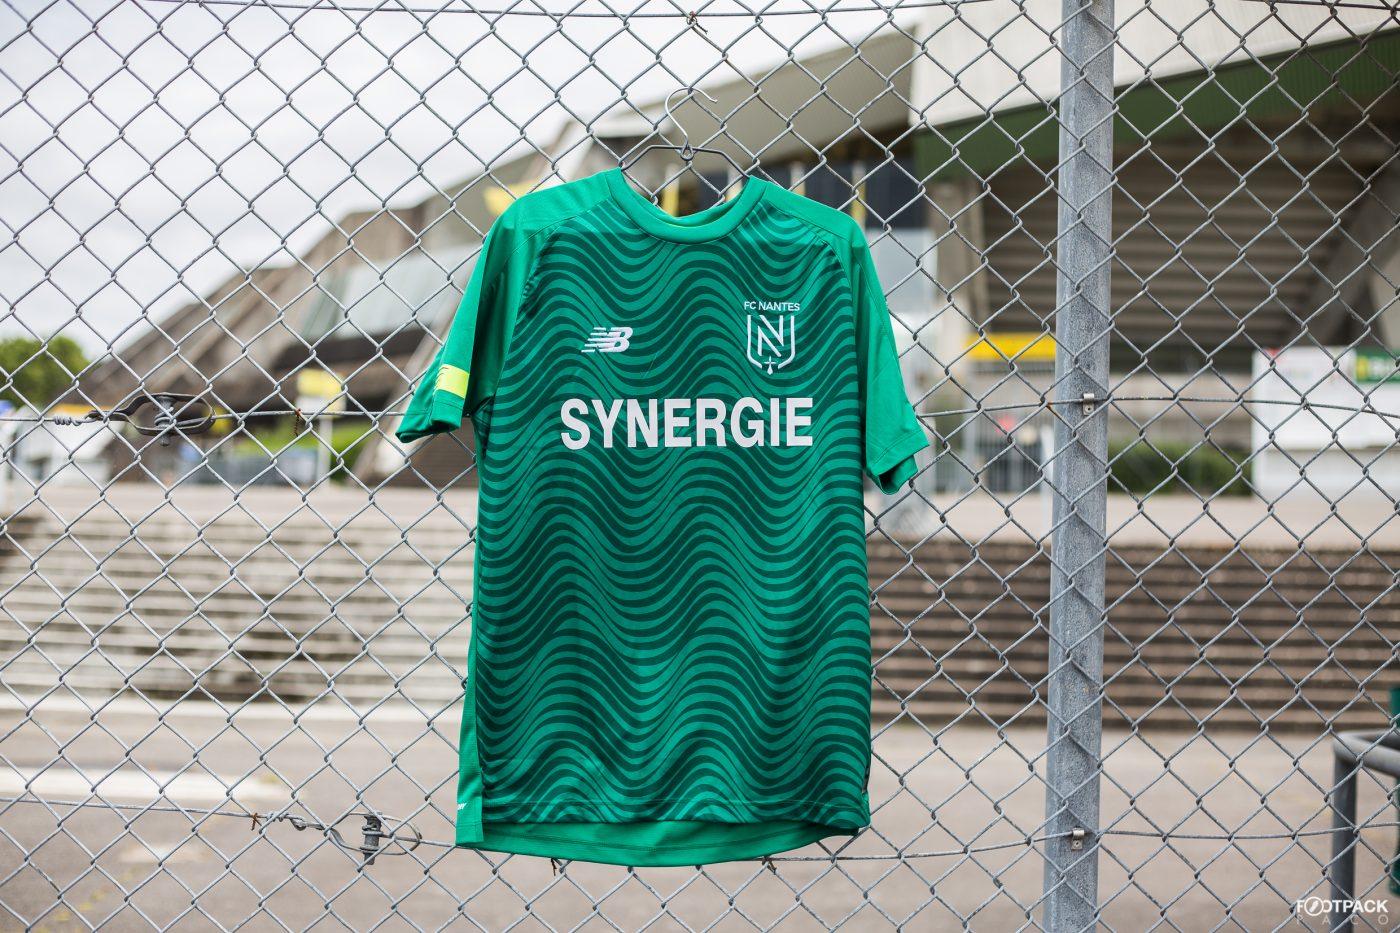 maillot-exterieur-fc-nantes-2019-2020-new-balance-footpack-7